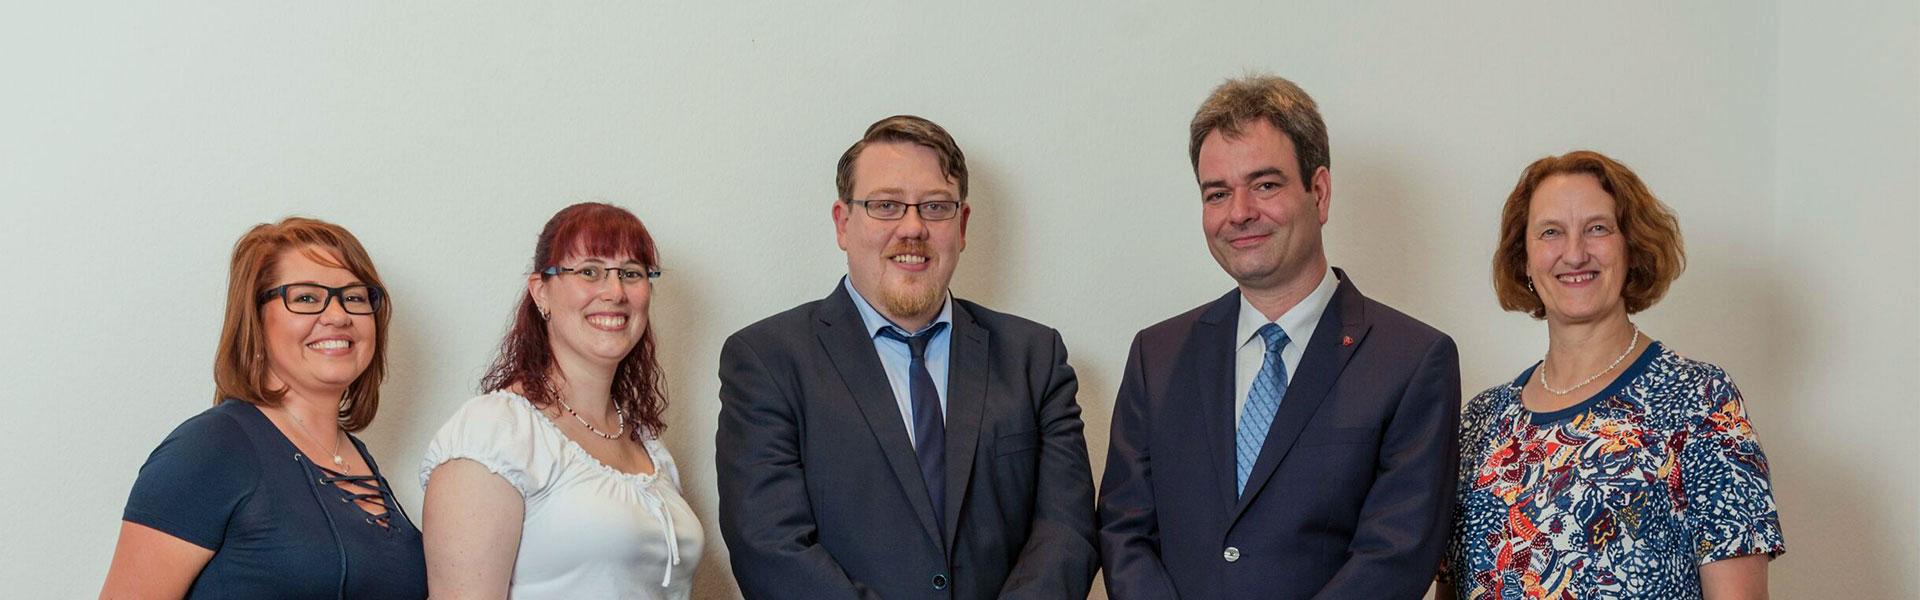 Rechtsanwaltskanzlei Füssen Team